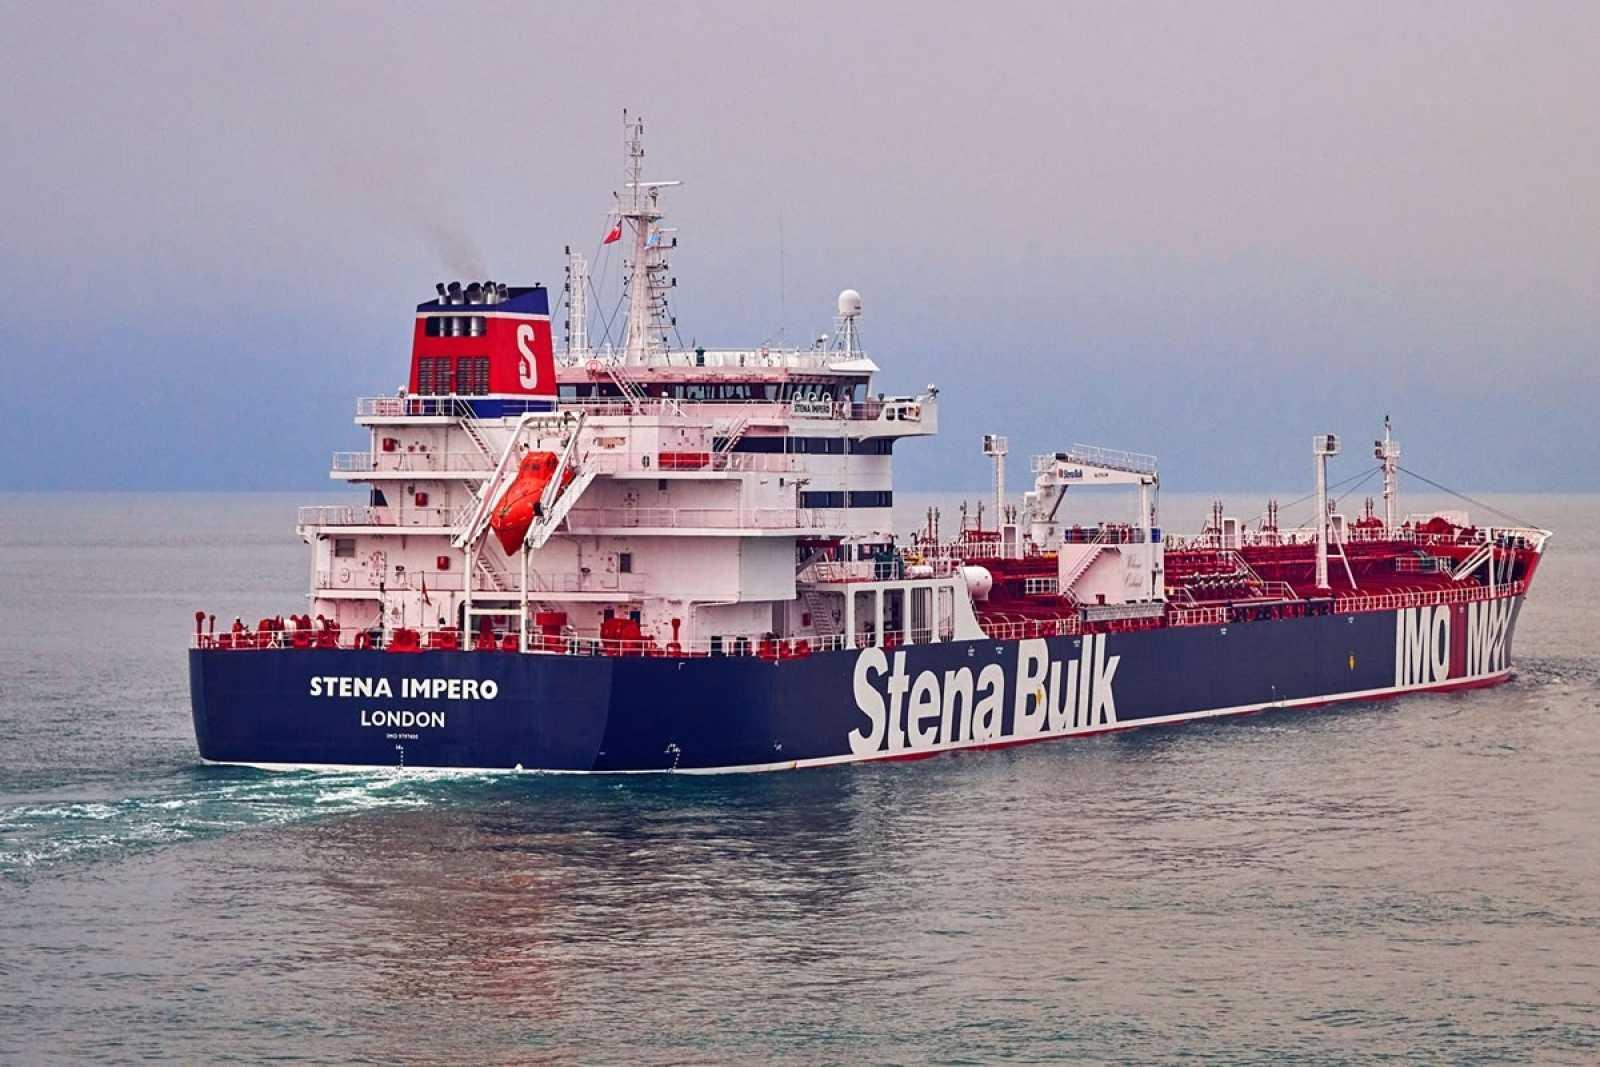 Stena_bulk